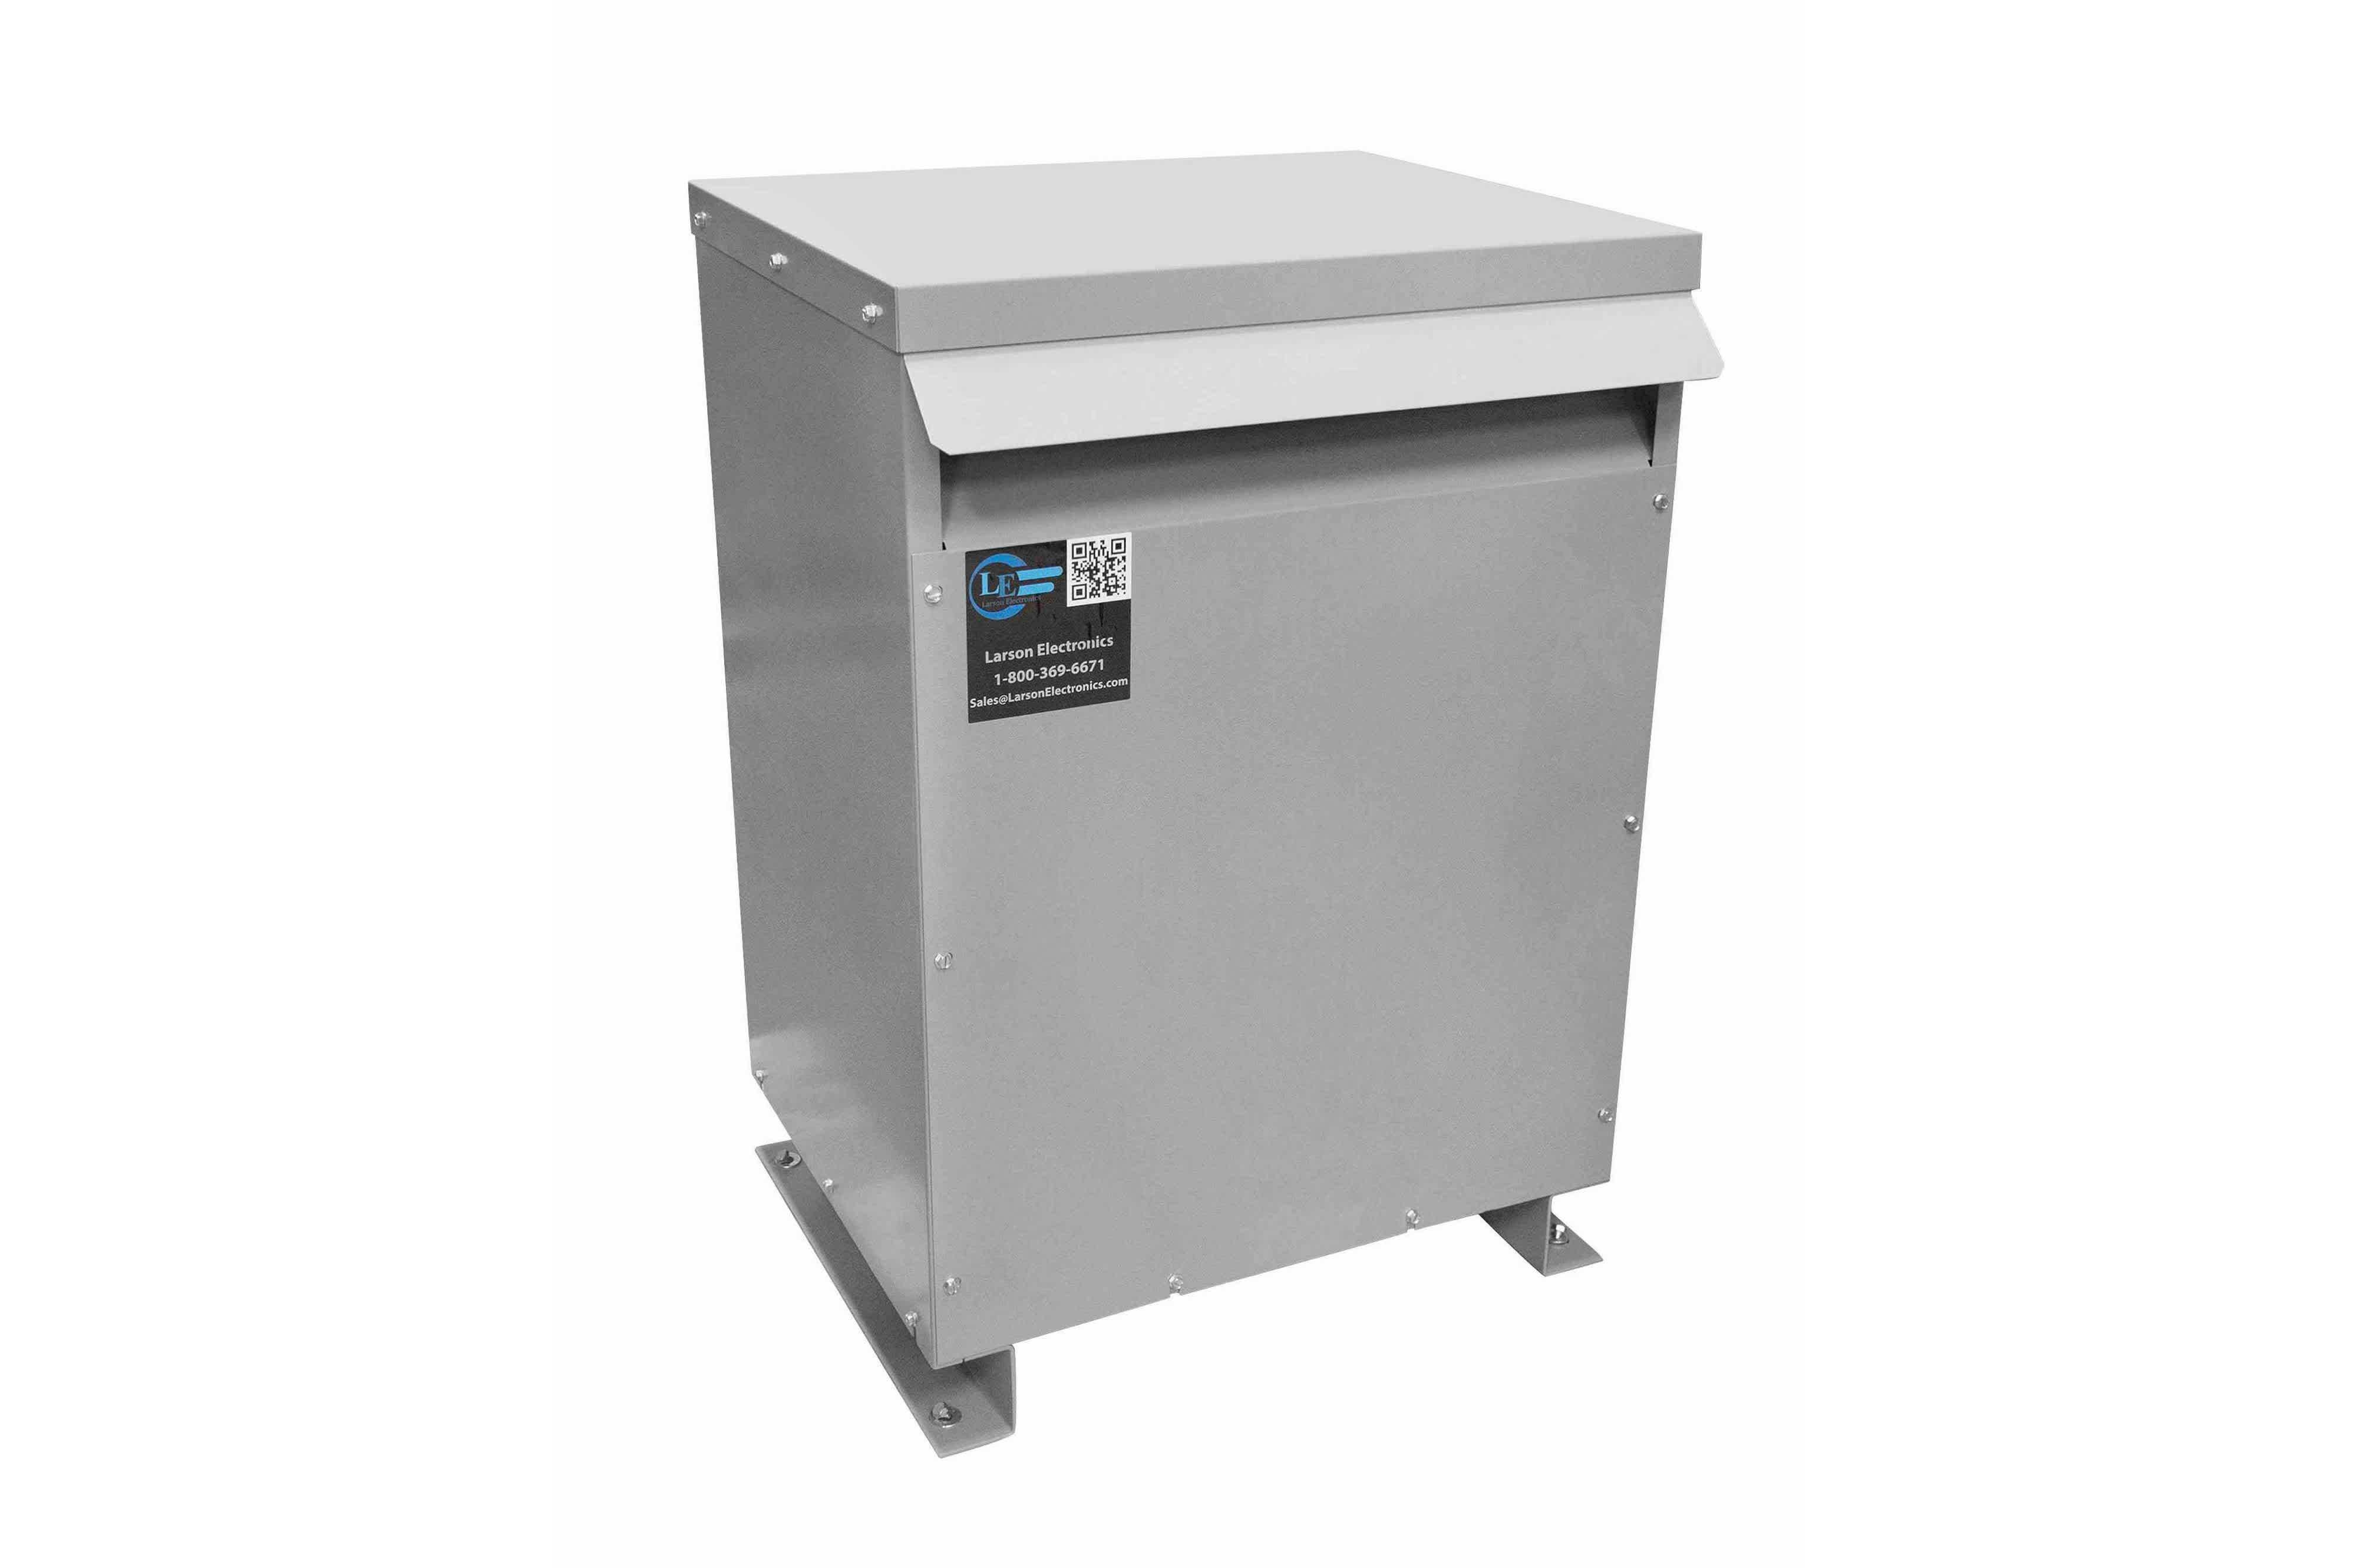 37.5 kVA 3PH DOE Transformer, 415V Delta Primary, 208Y/120 Wye-N Secondary, N3R, Ventilated, 60 Hz